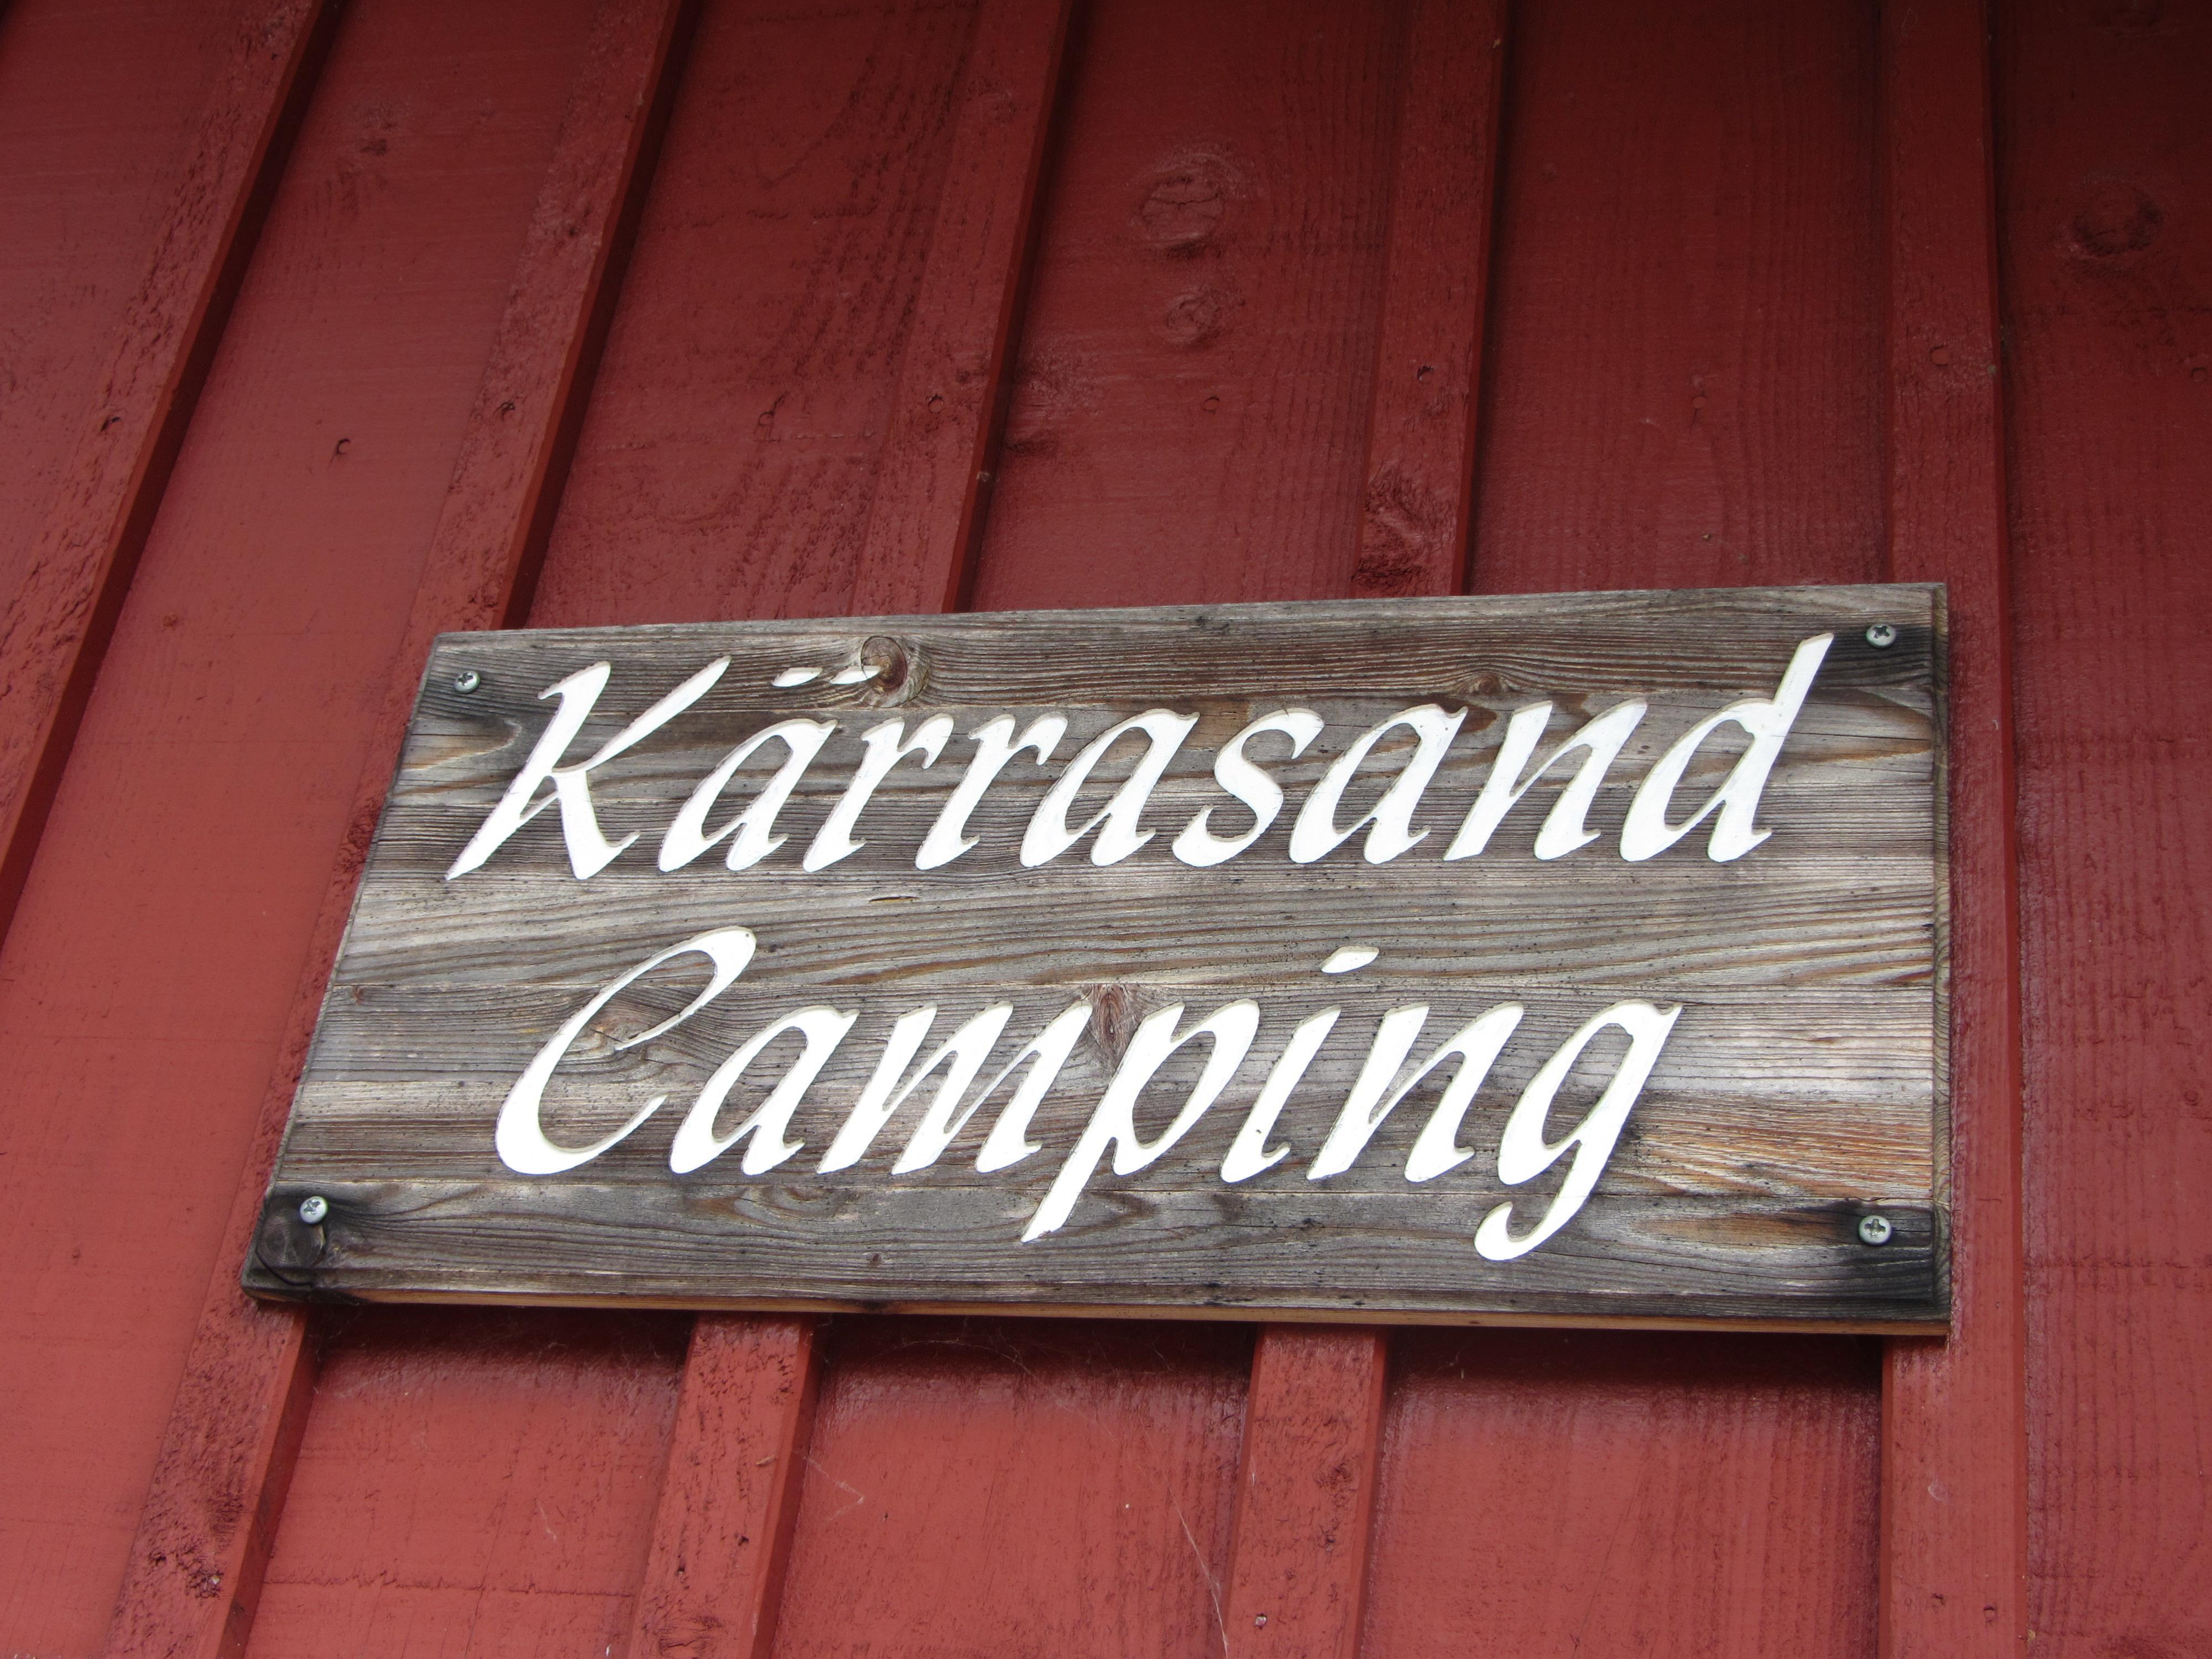 Karin Nilsson,  © Tingsryds Turistbyrå, Loppis på Kärrasands camping